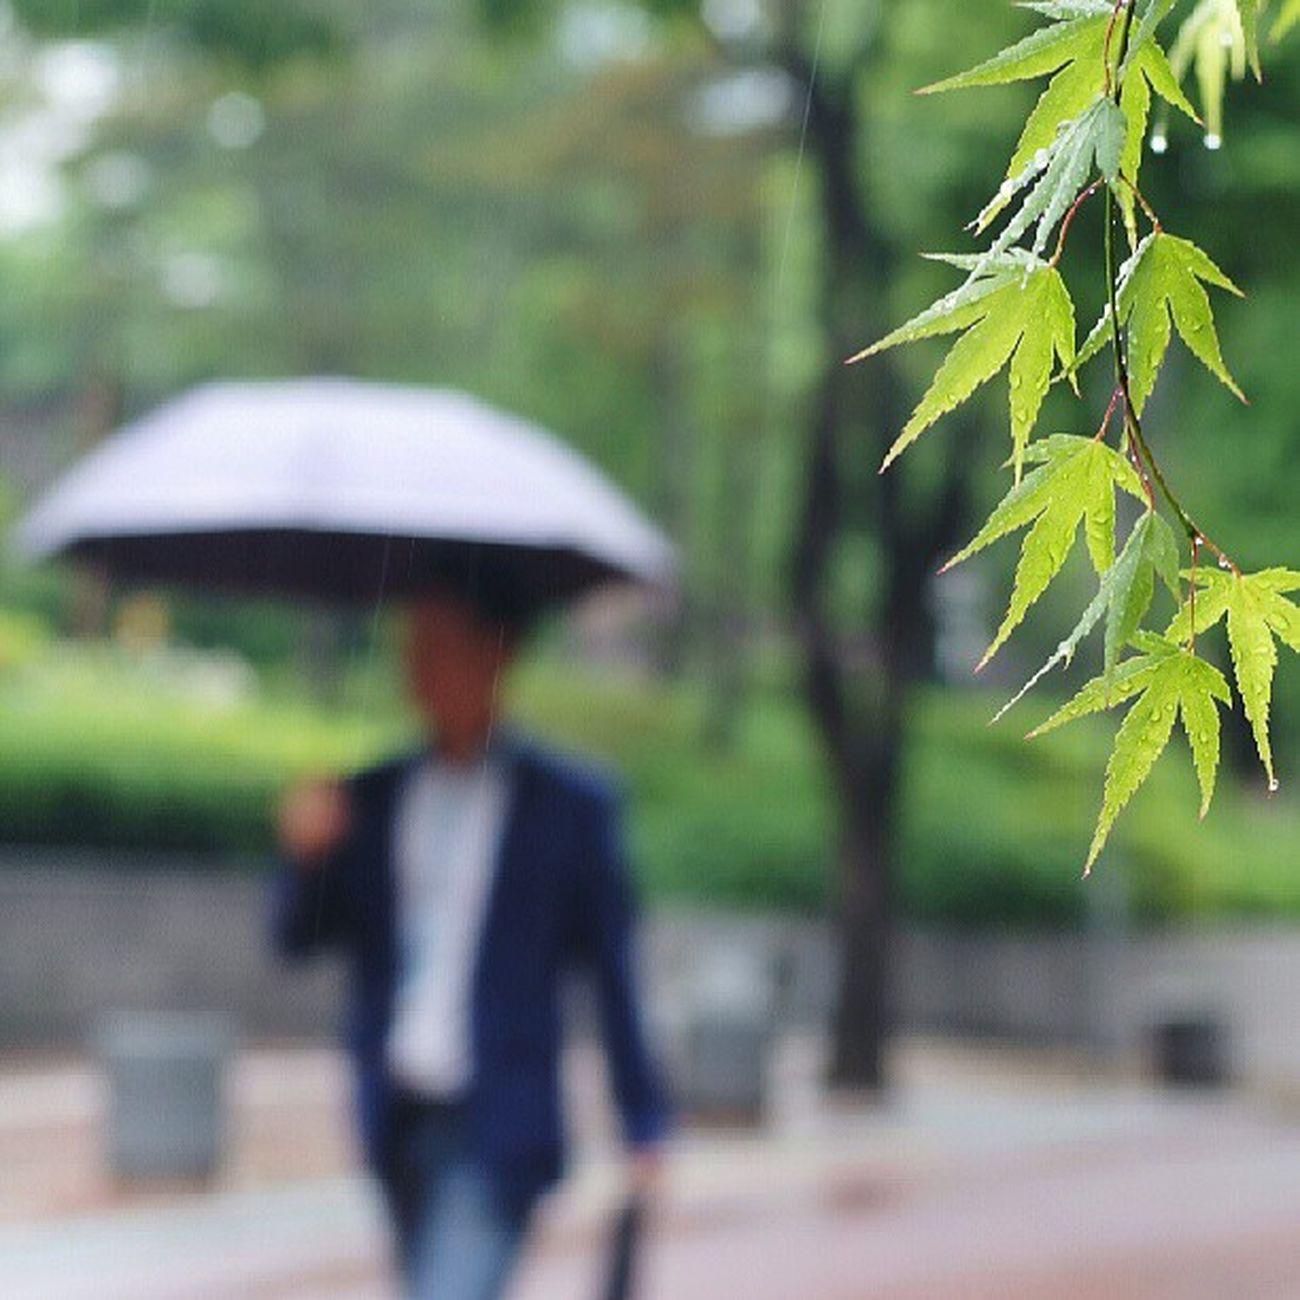 Robin_theme15 City of rain 장마 시작 뿅 서소문동